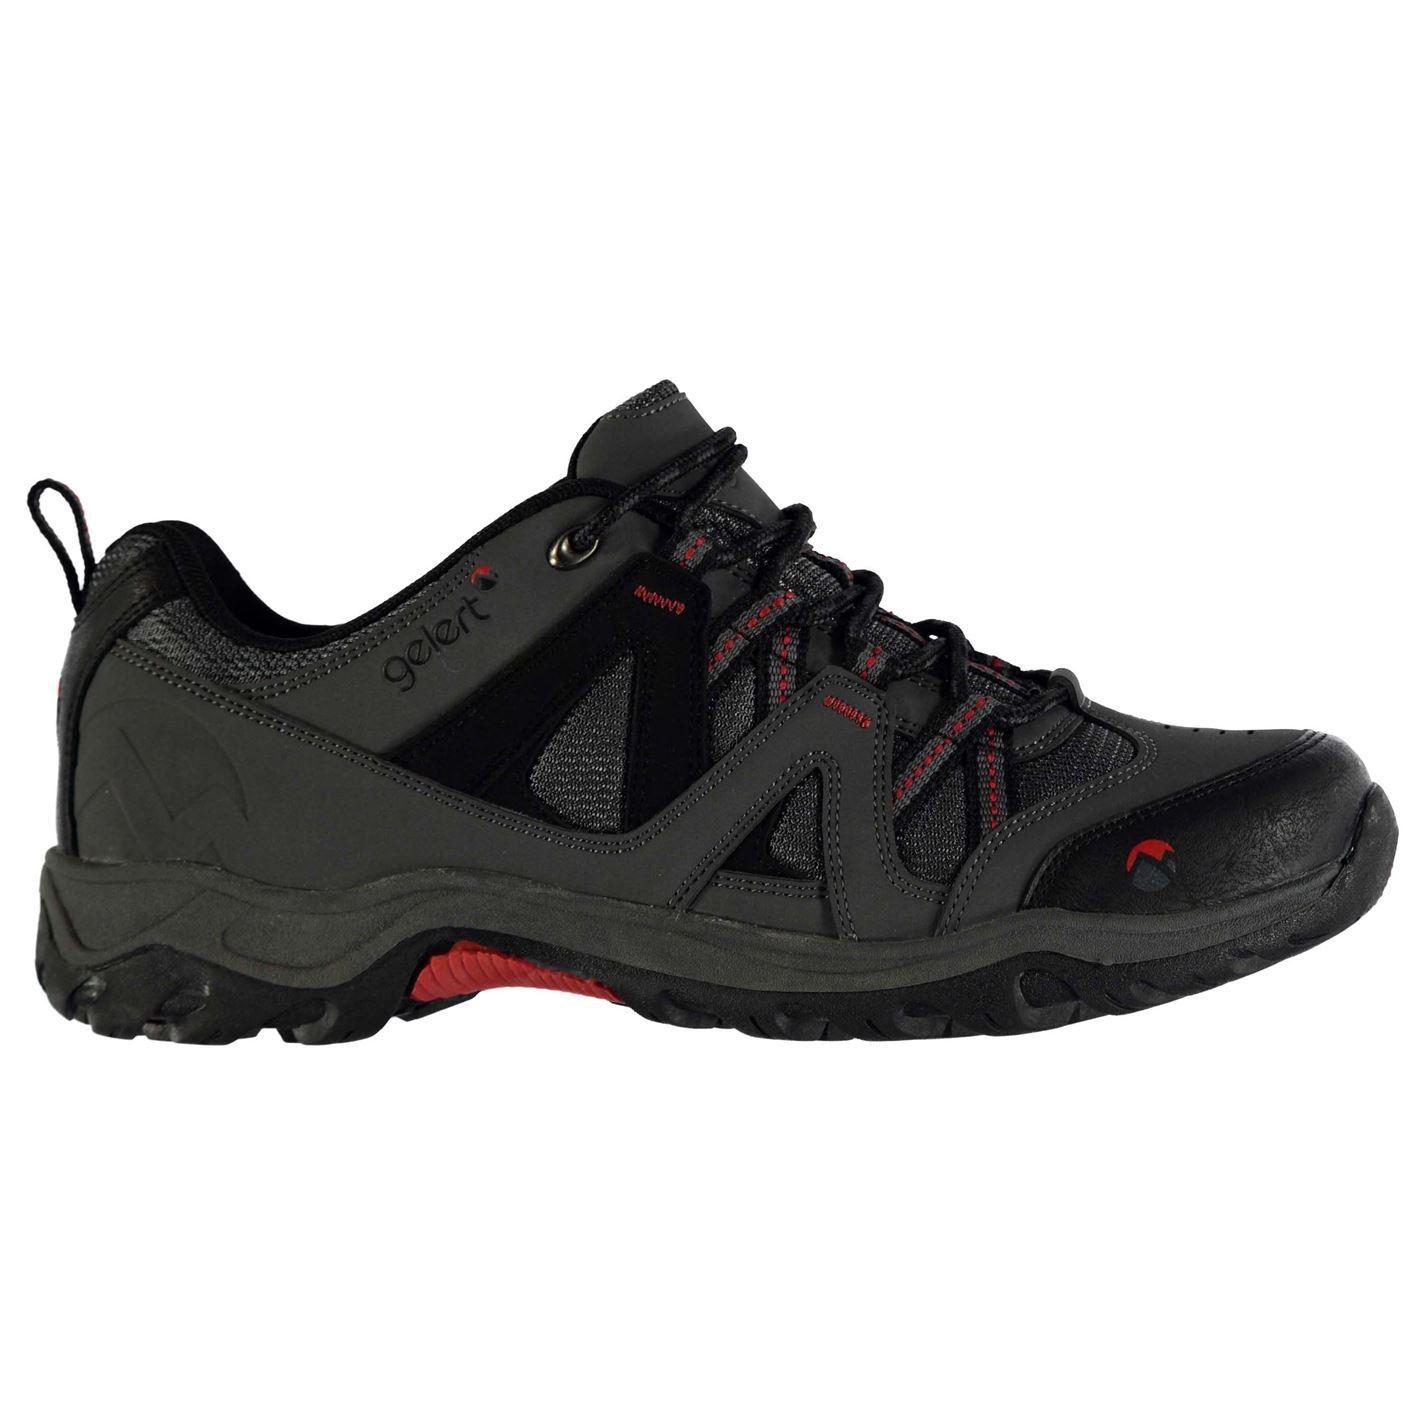 Gelert Ottawa Niedriger Wanderschuhe Herren Wandern Schuhwerk Schuhwerk Schuhwerk Stiefel 40d3d5